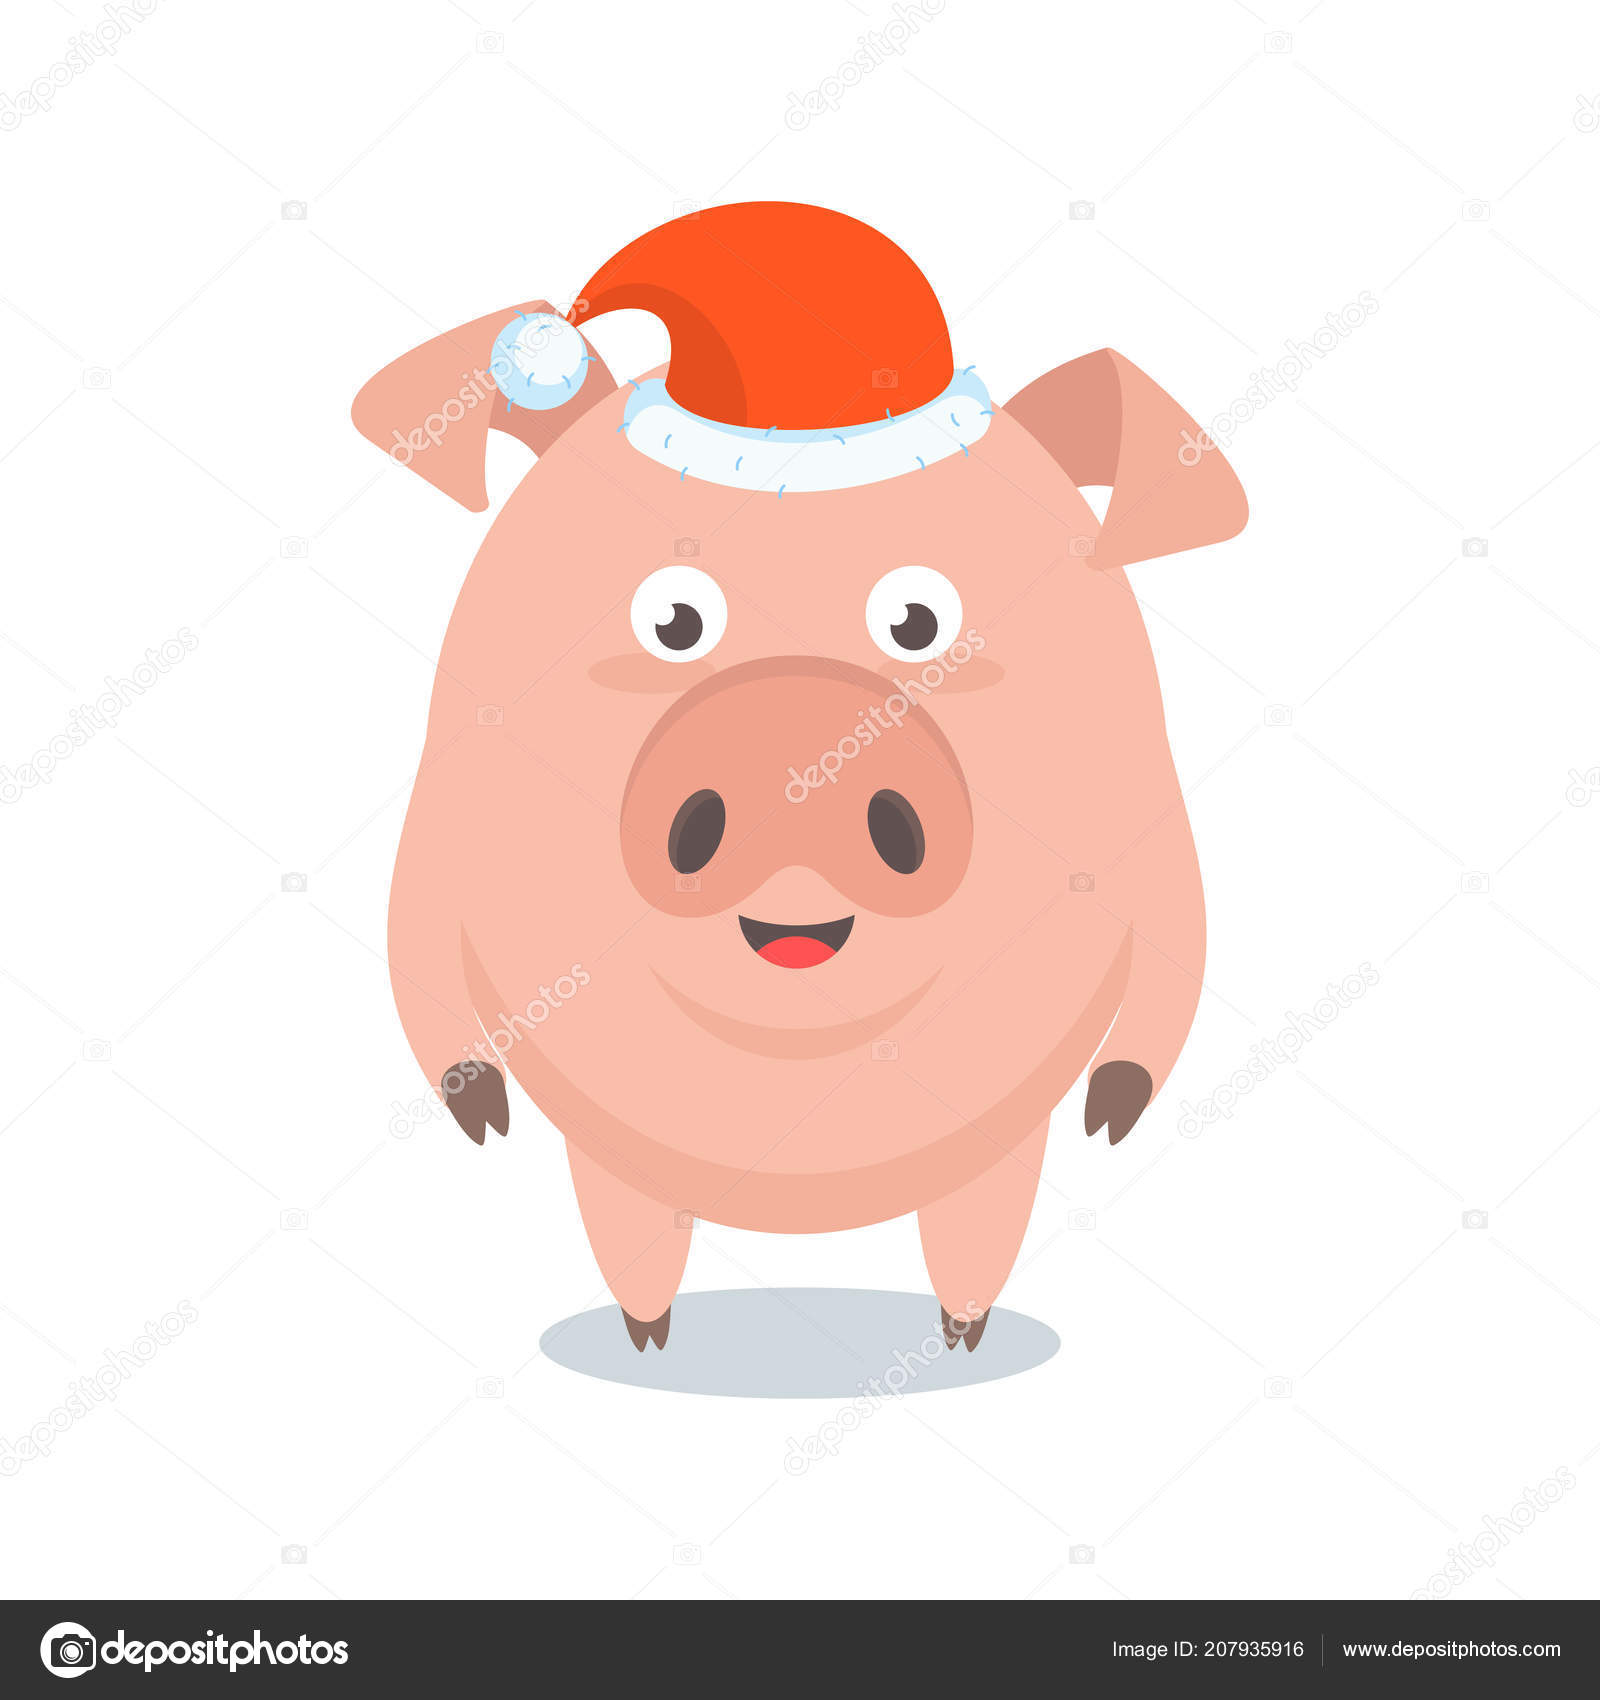 Funny merry pig in Santa Claus hat — Stock Vector © quarta #207935916